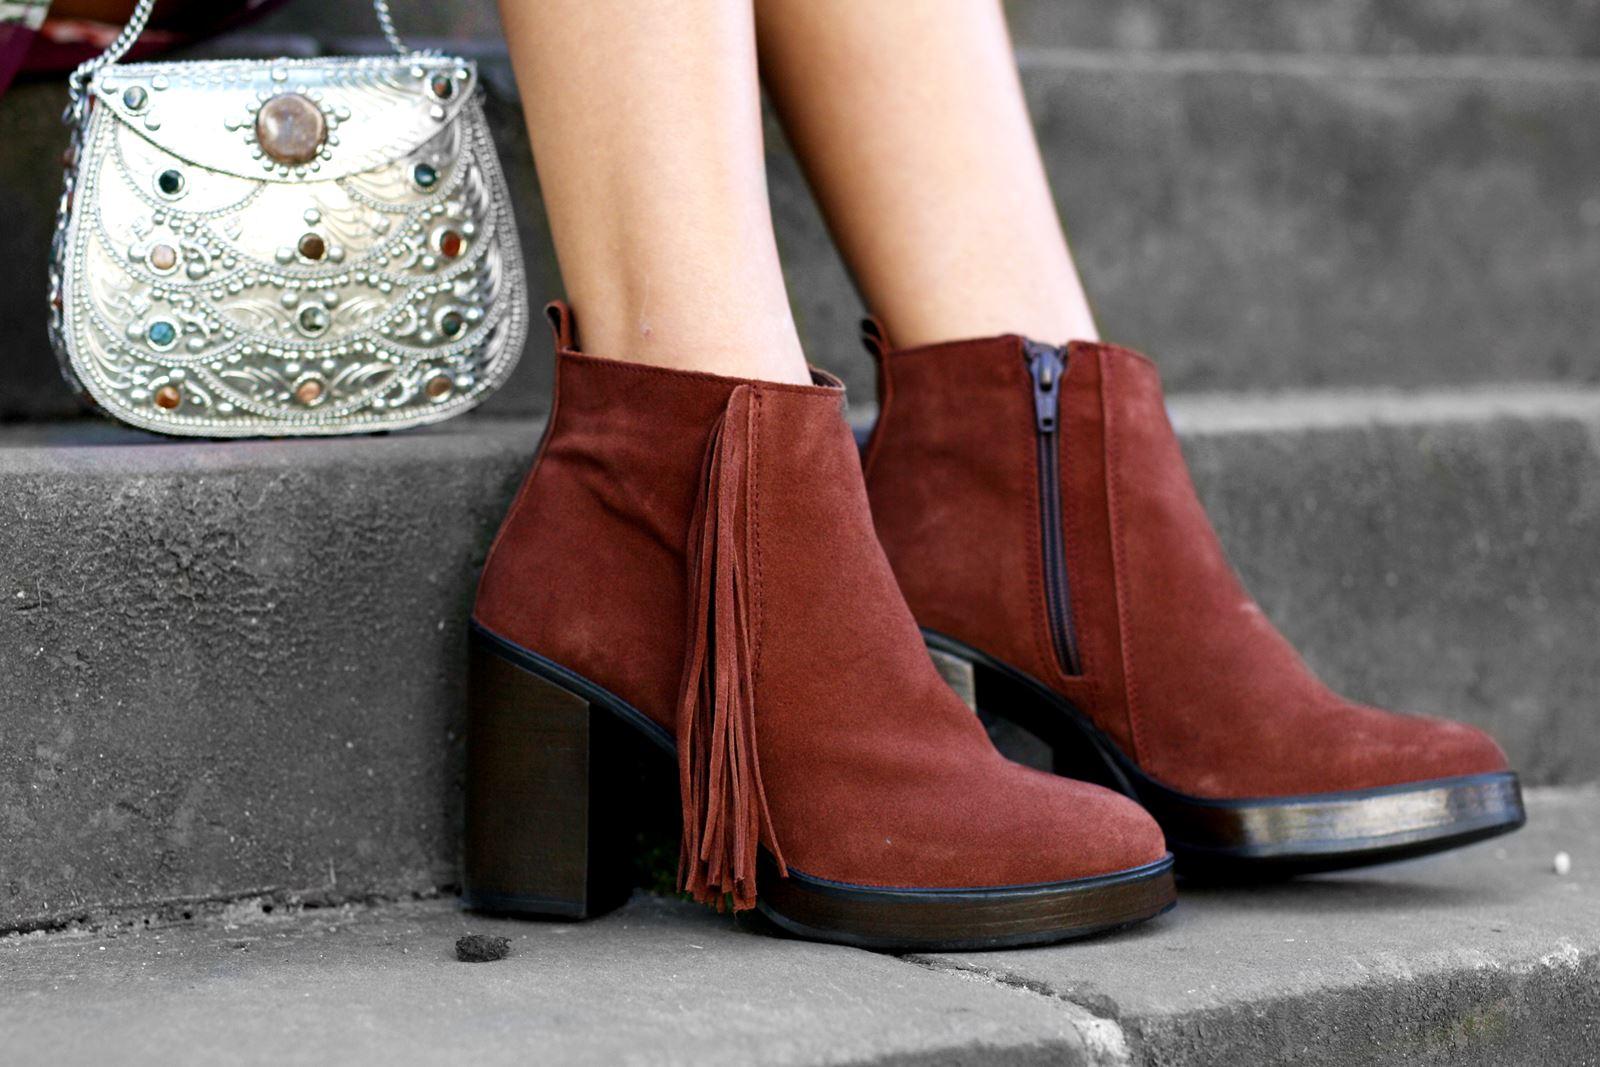 modeblog-german-fashion-blog-outfit-stiefeletten-rotes-blumenkleid-5